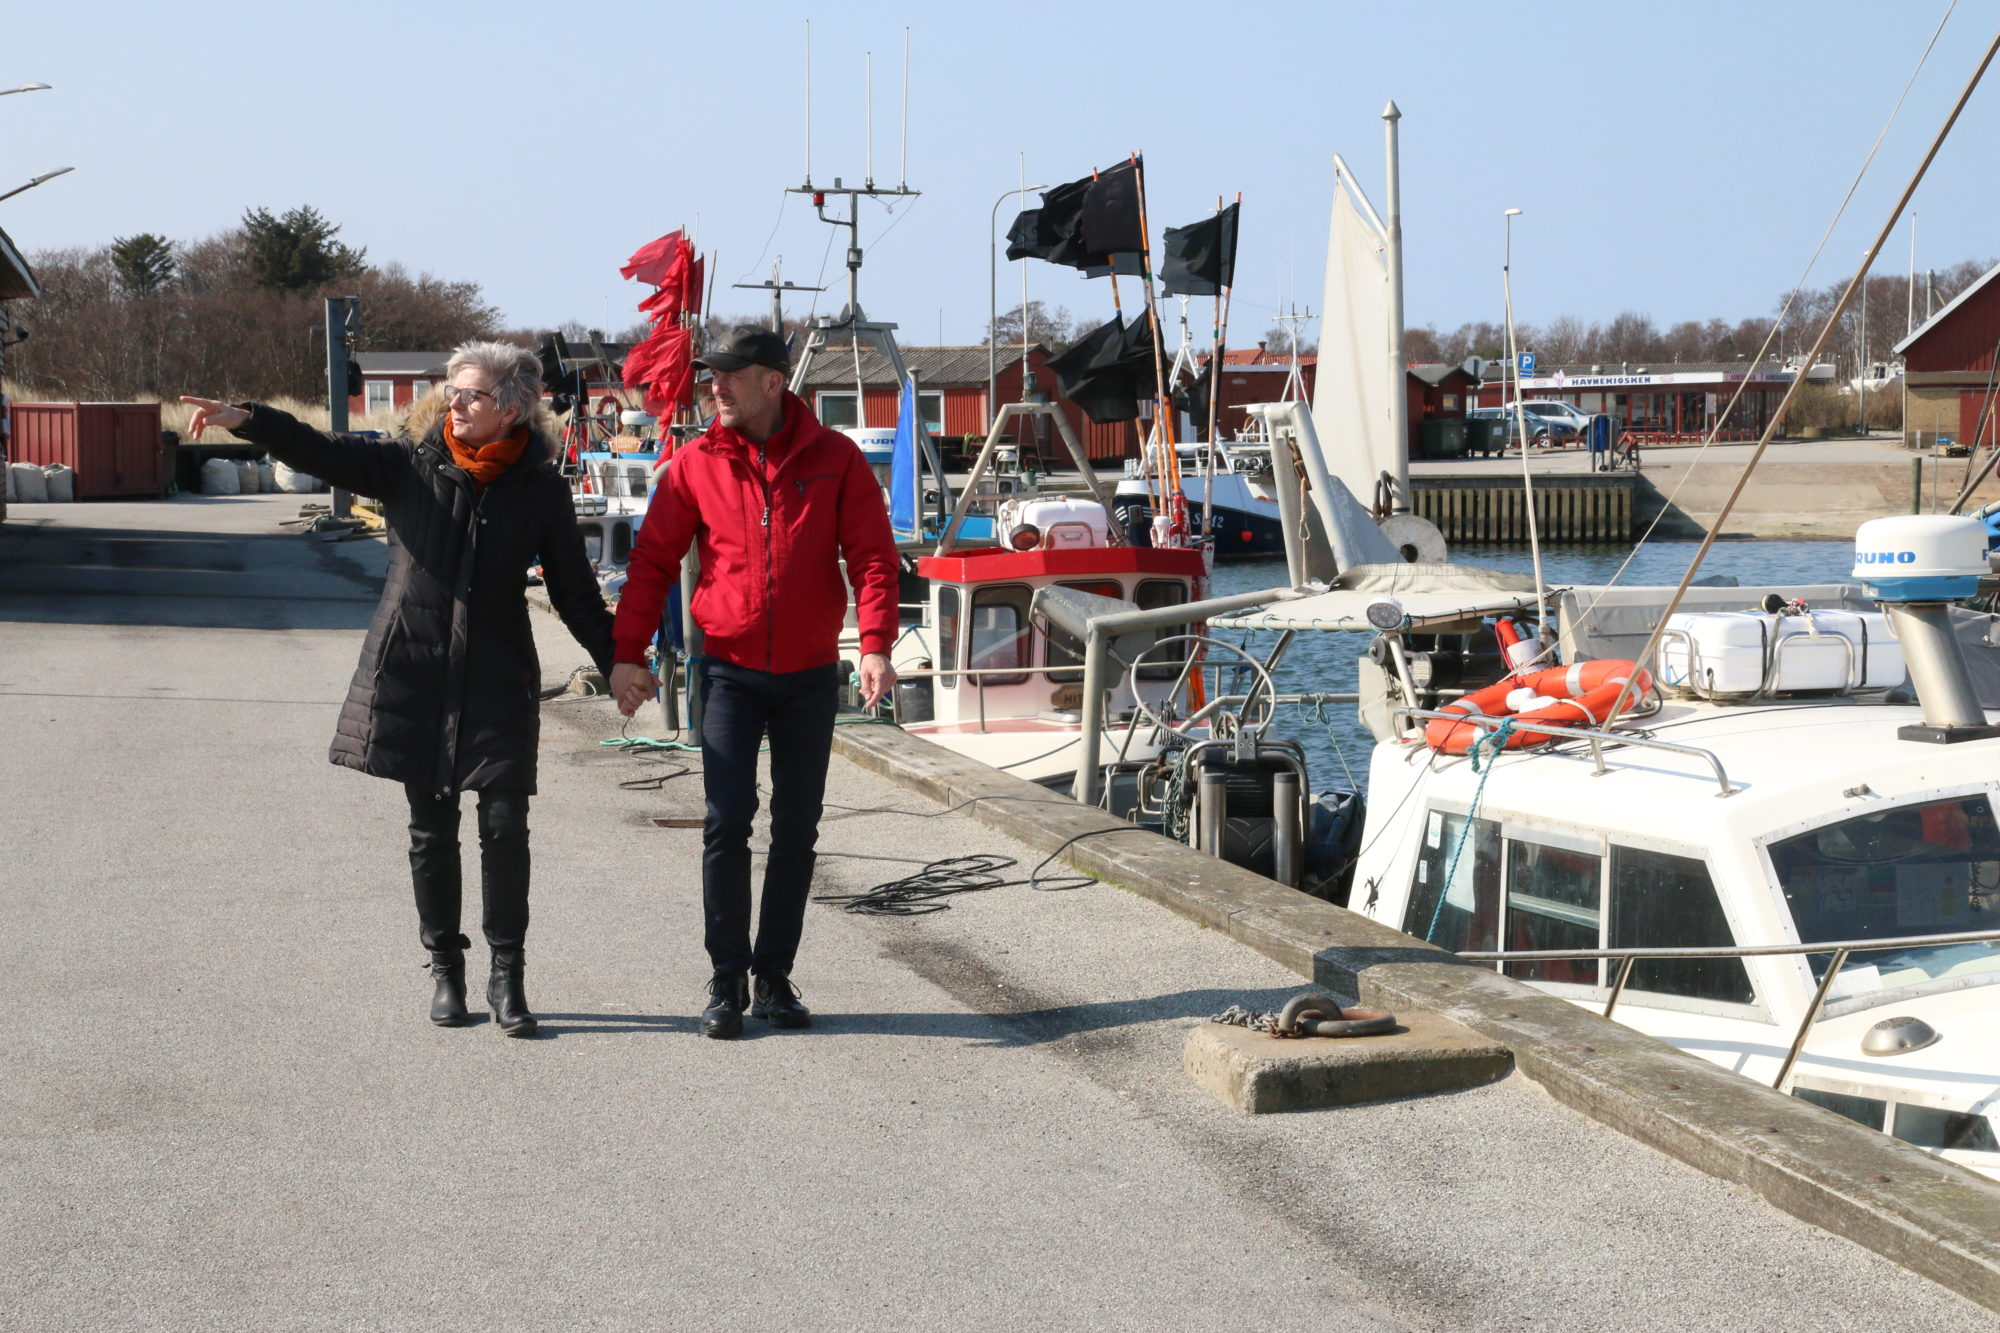 Bare en kort spasertur fra kroen, ligger en koselig havn og ikke minst fabelaktige strender. Foto: Fjord Line